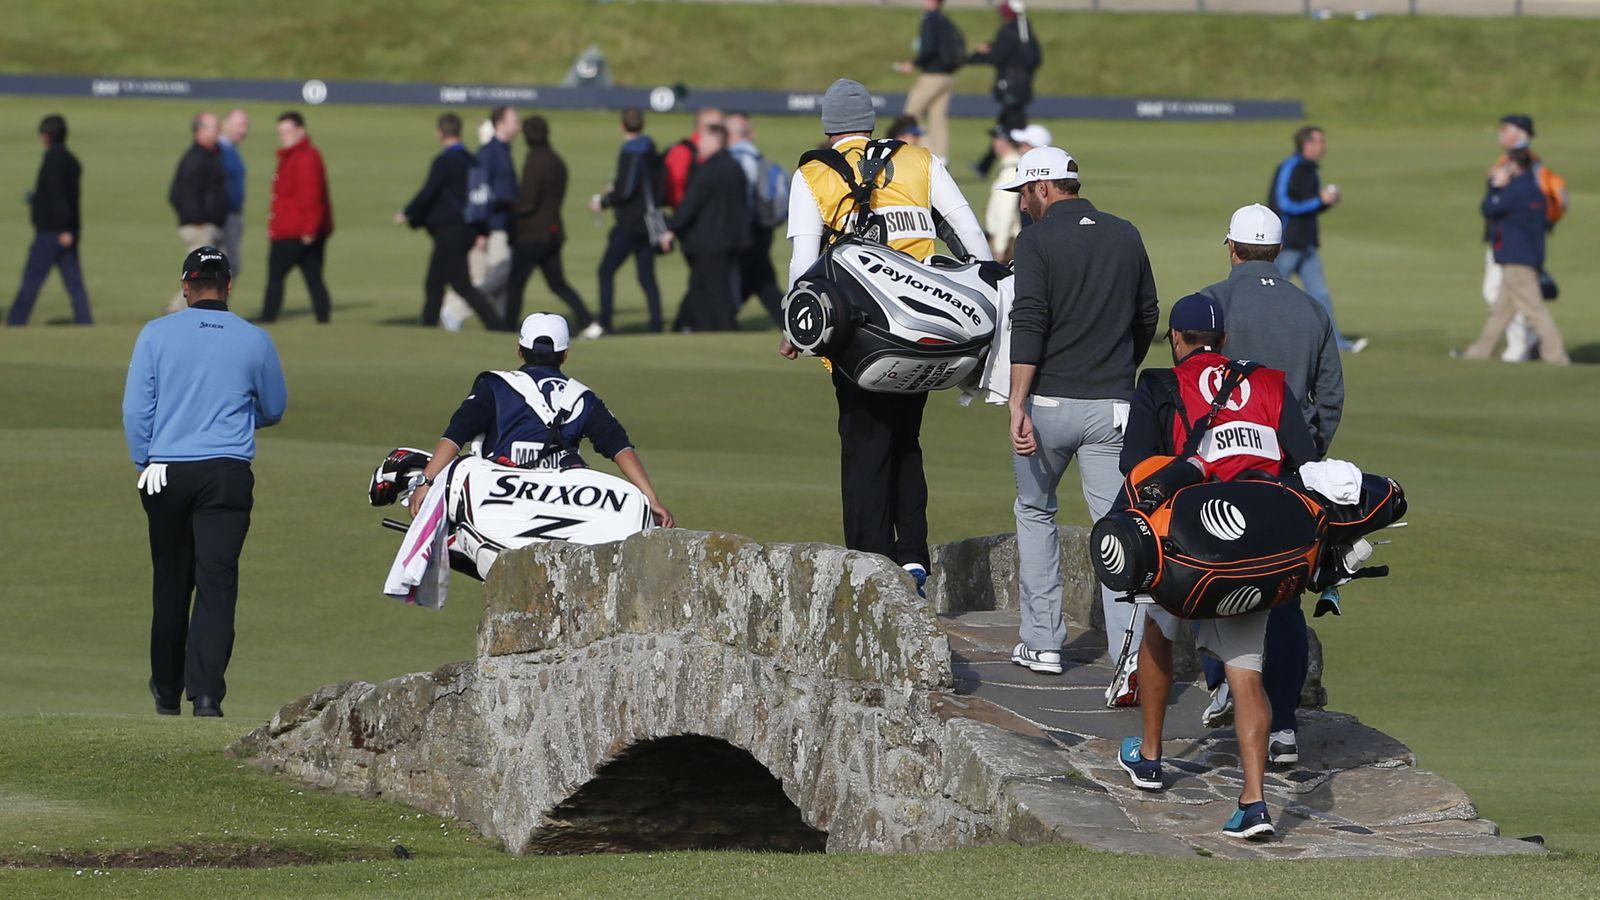 british open golf tv coverage usa